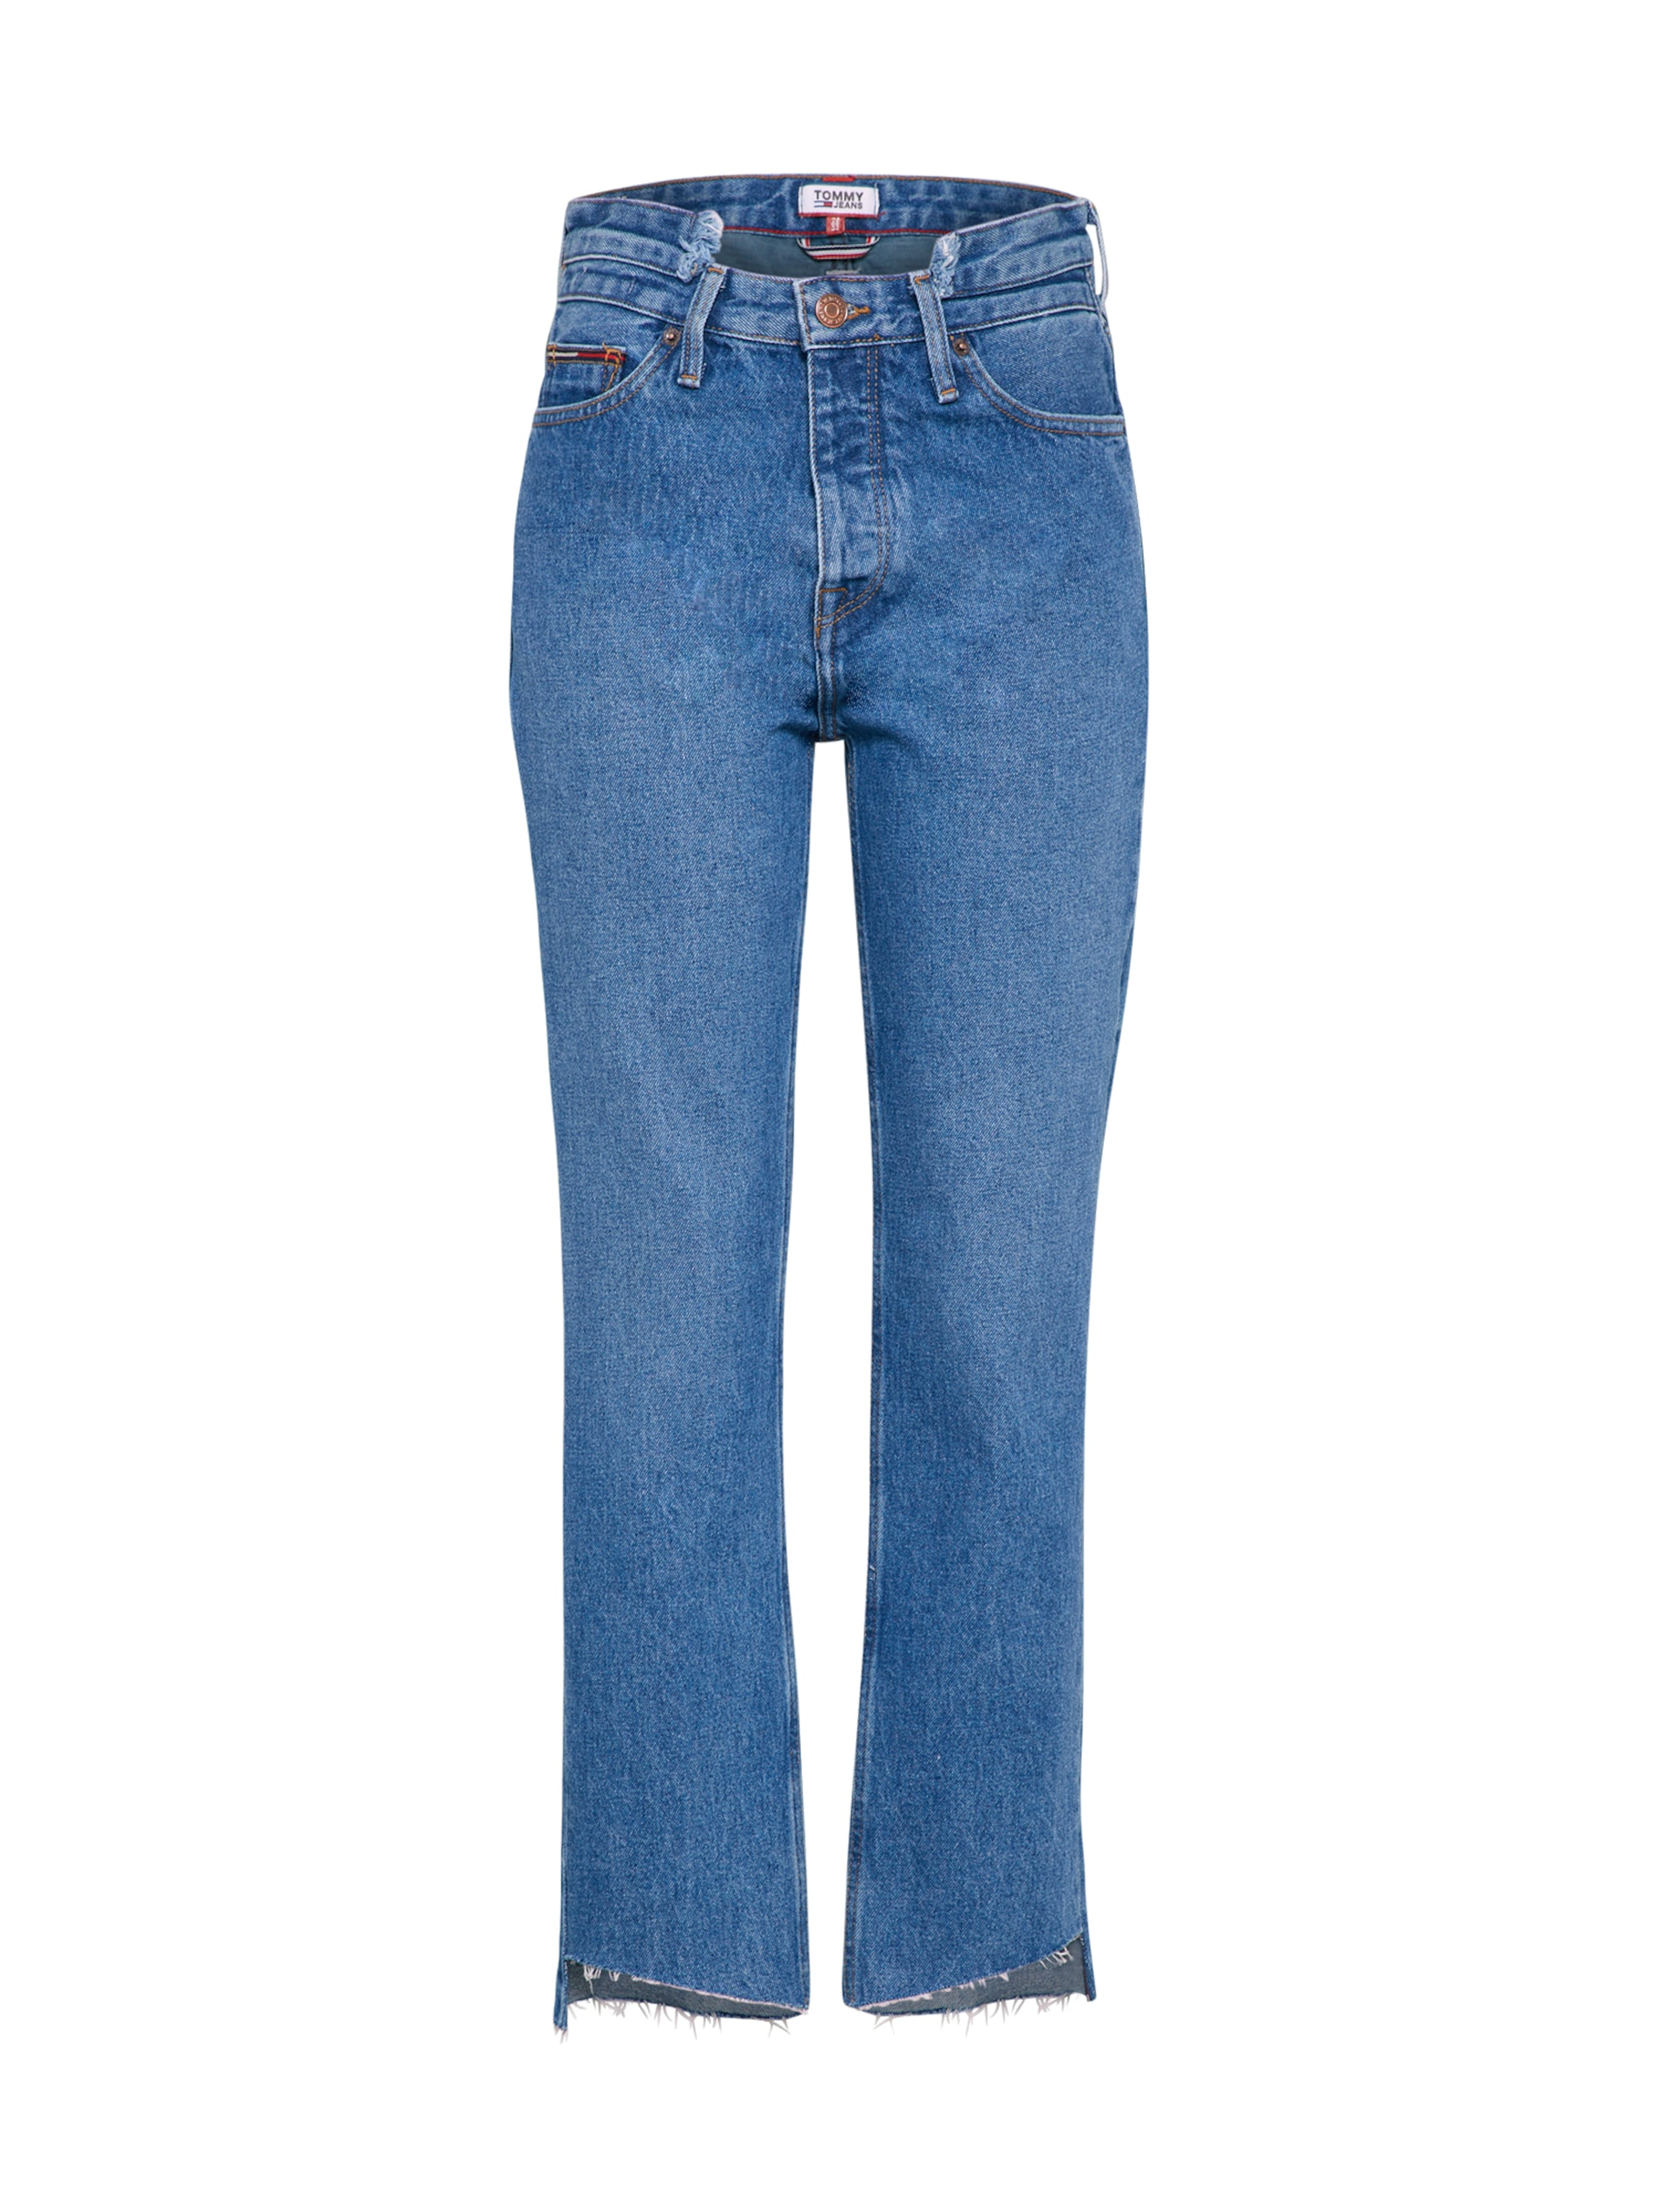 Tommy Denim Izzy' Slim Jeans Slimfit Blue 'high Rise In ZPukXi